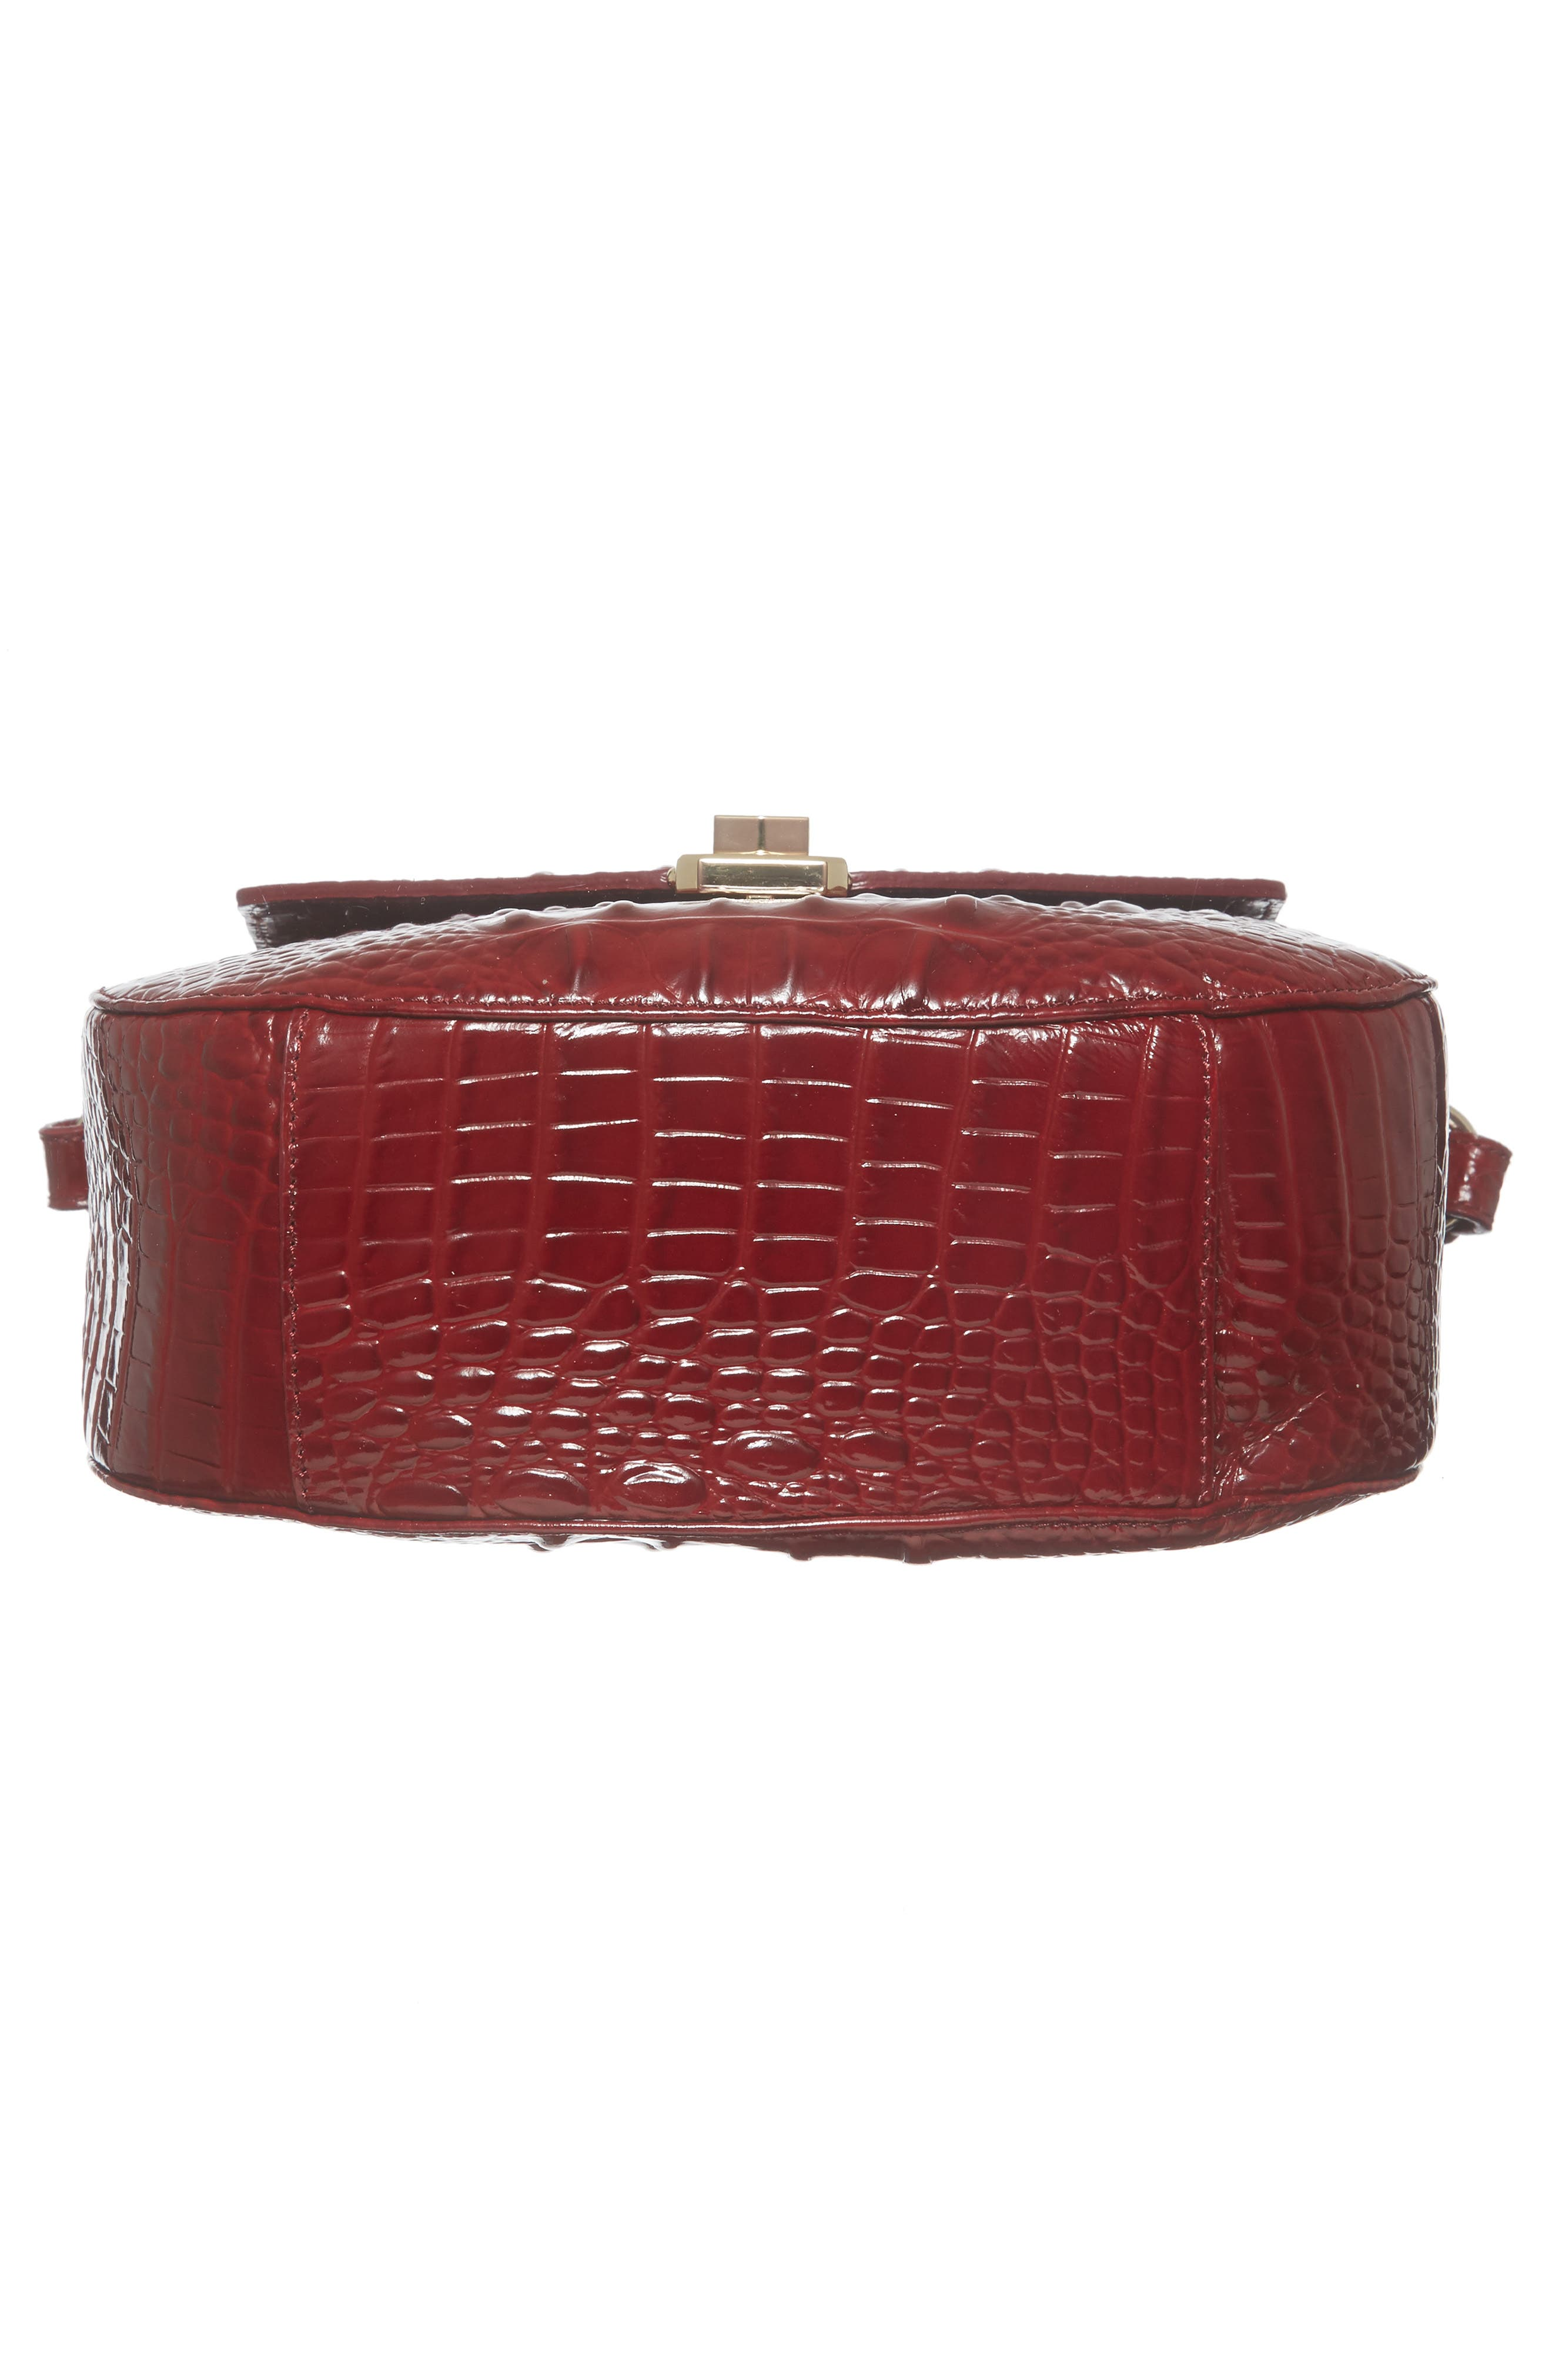 Melbourne - Lizzie Leather Crossbody Bag,                             Alternate thumbnail 30, color,